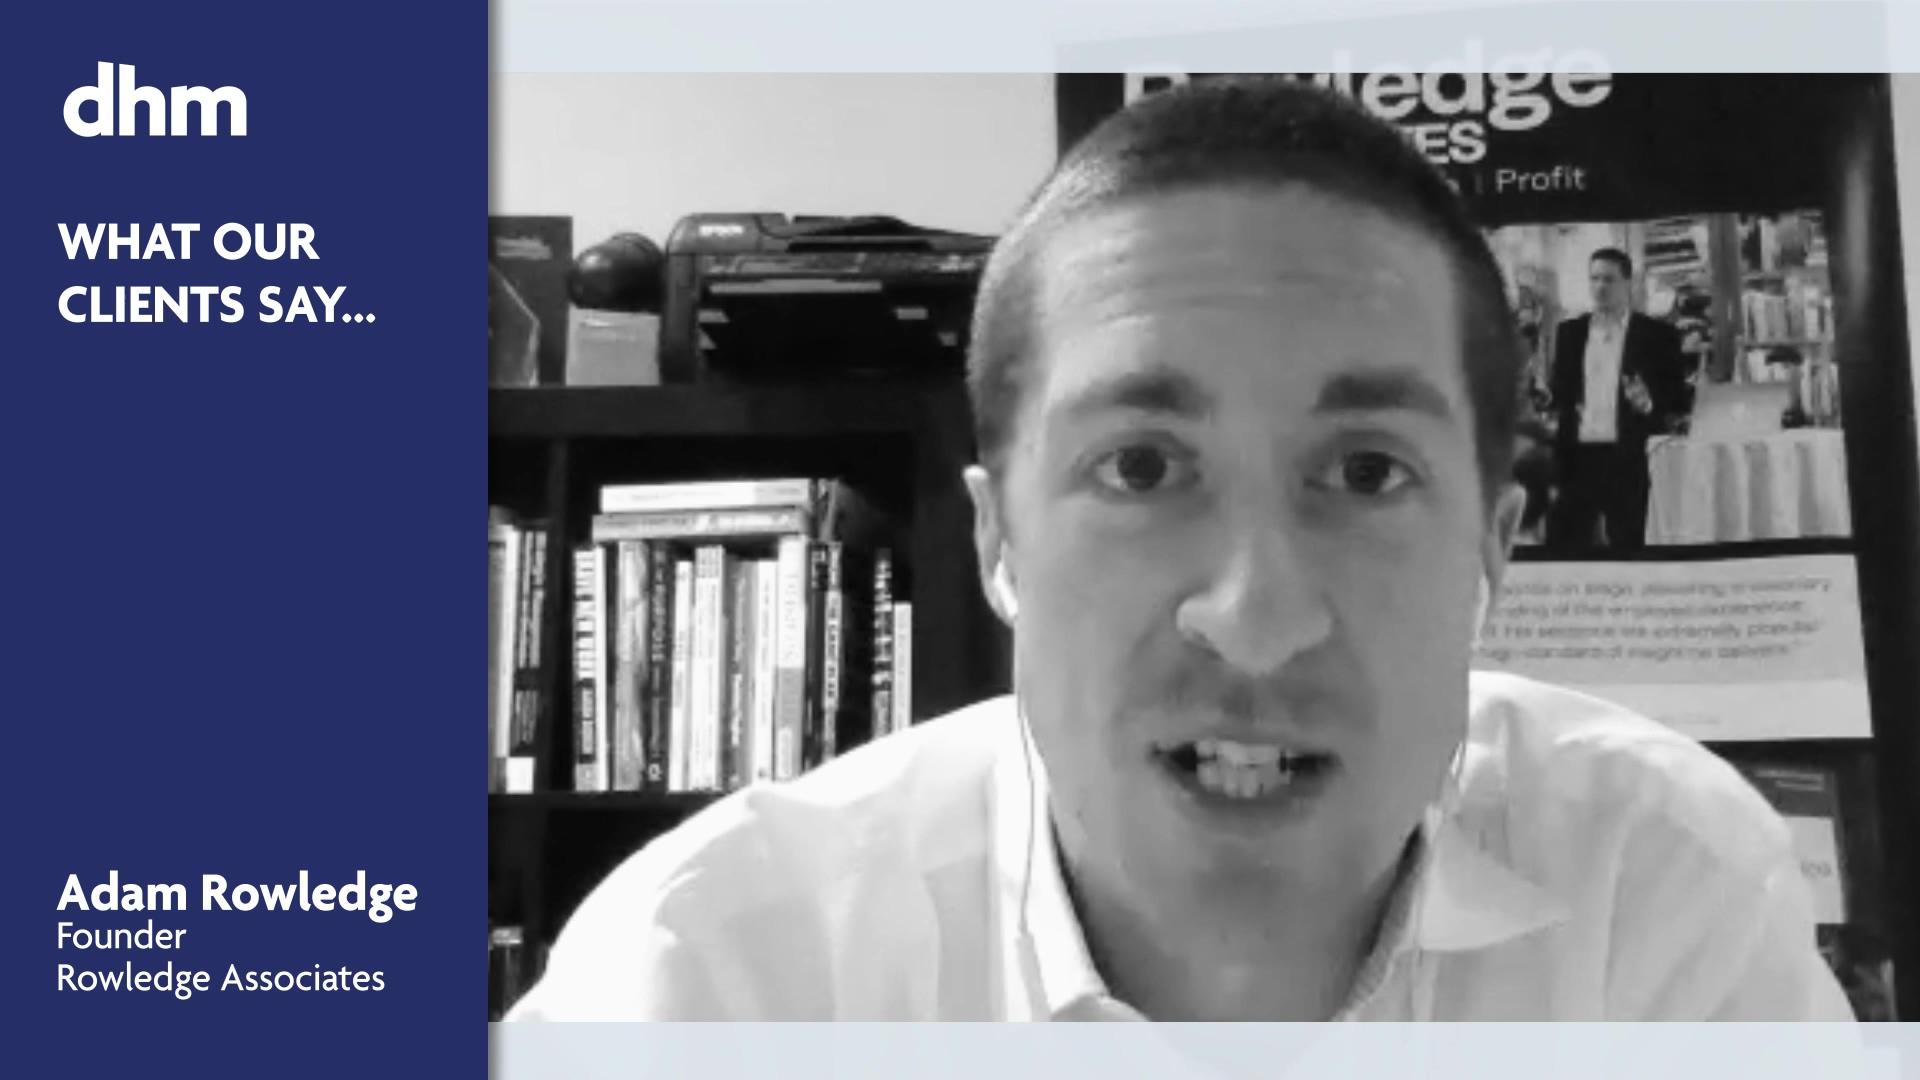 DHM - Adam Rowledge Testimonial (SHORT) v2 (1)